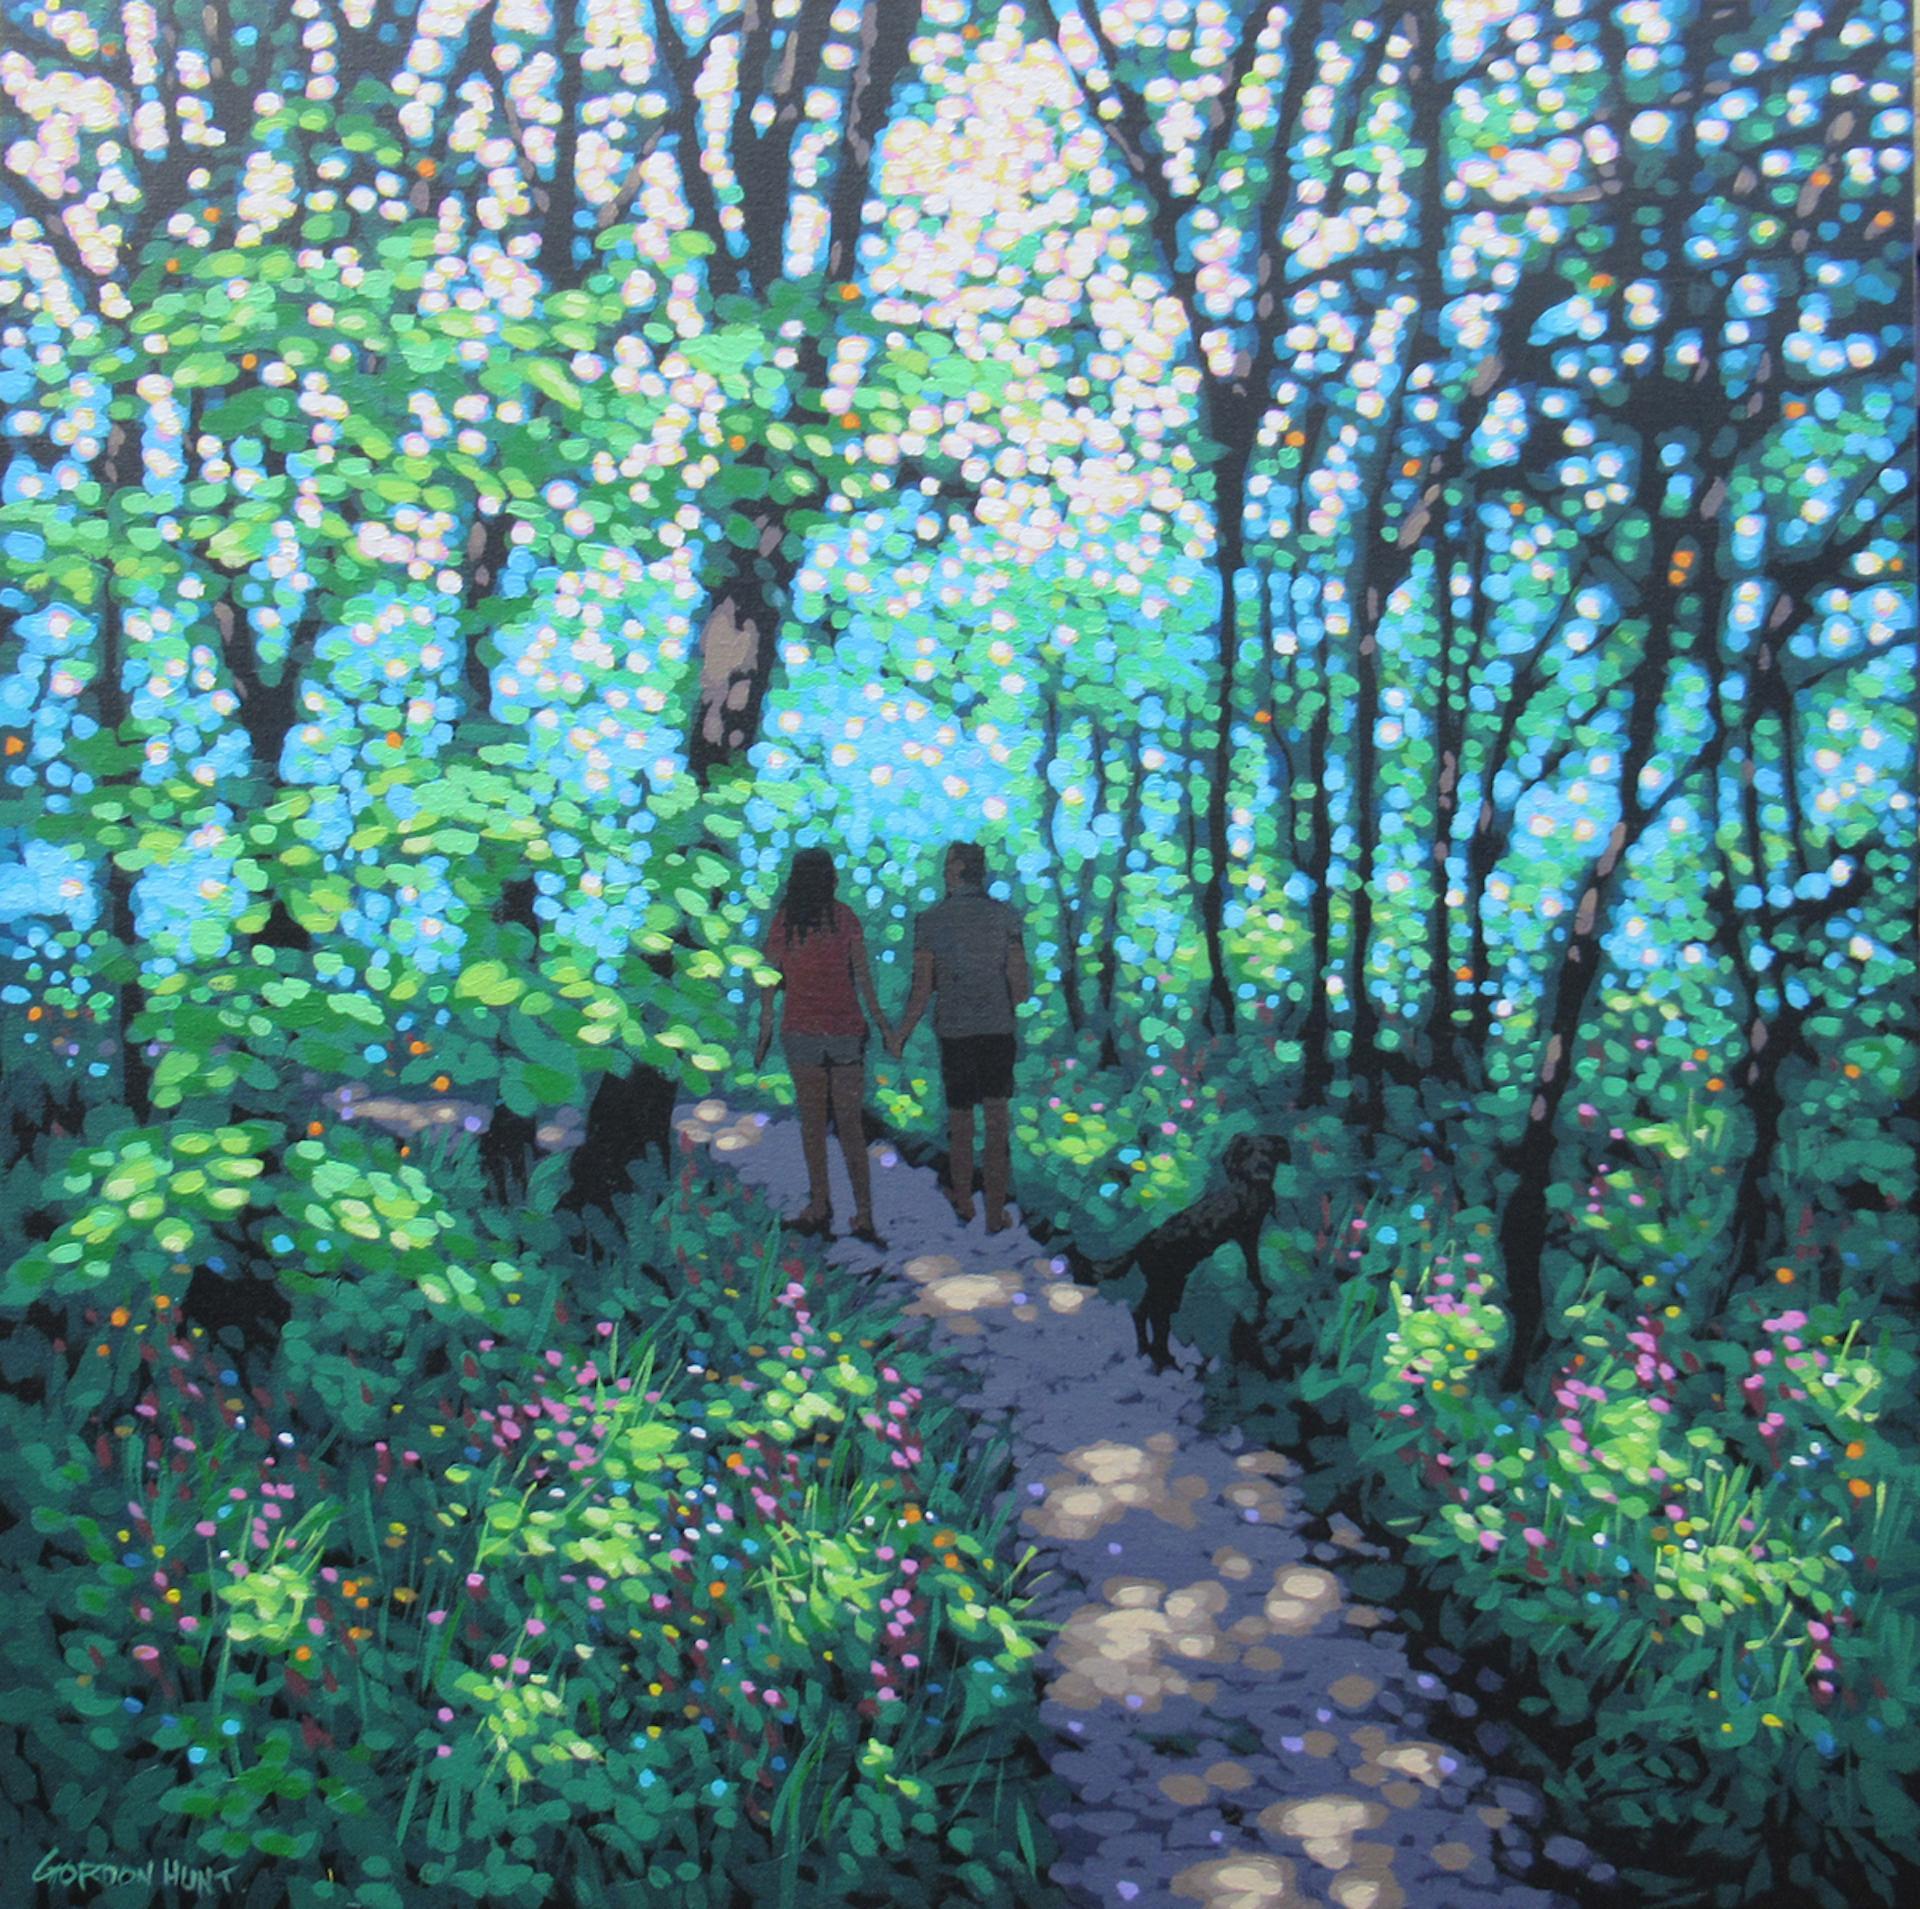 Gordon Hunt, Woodland Walk to the Beach, Landscape Art, Affordable Art